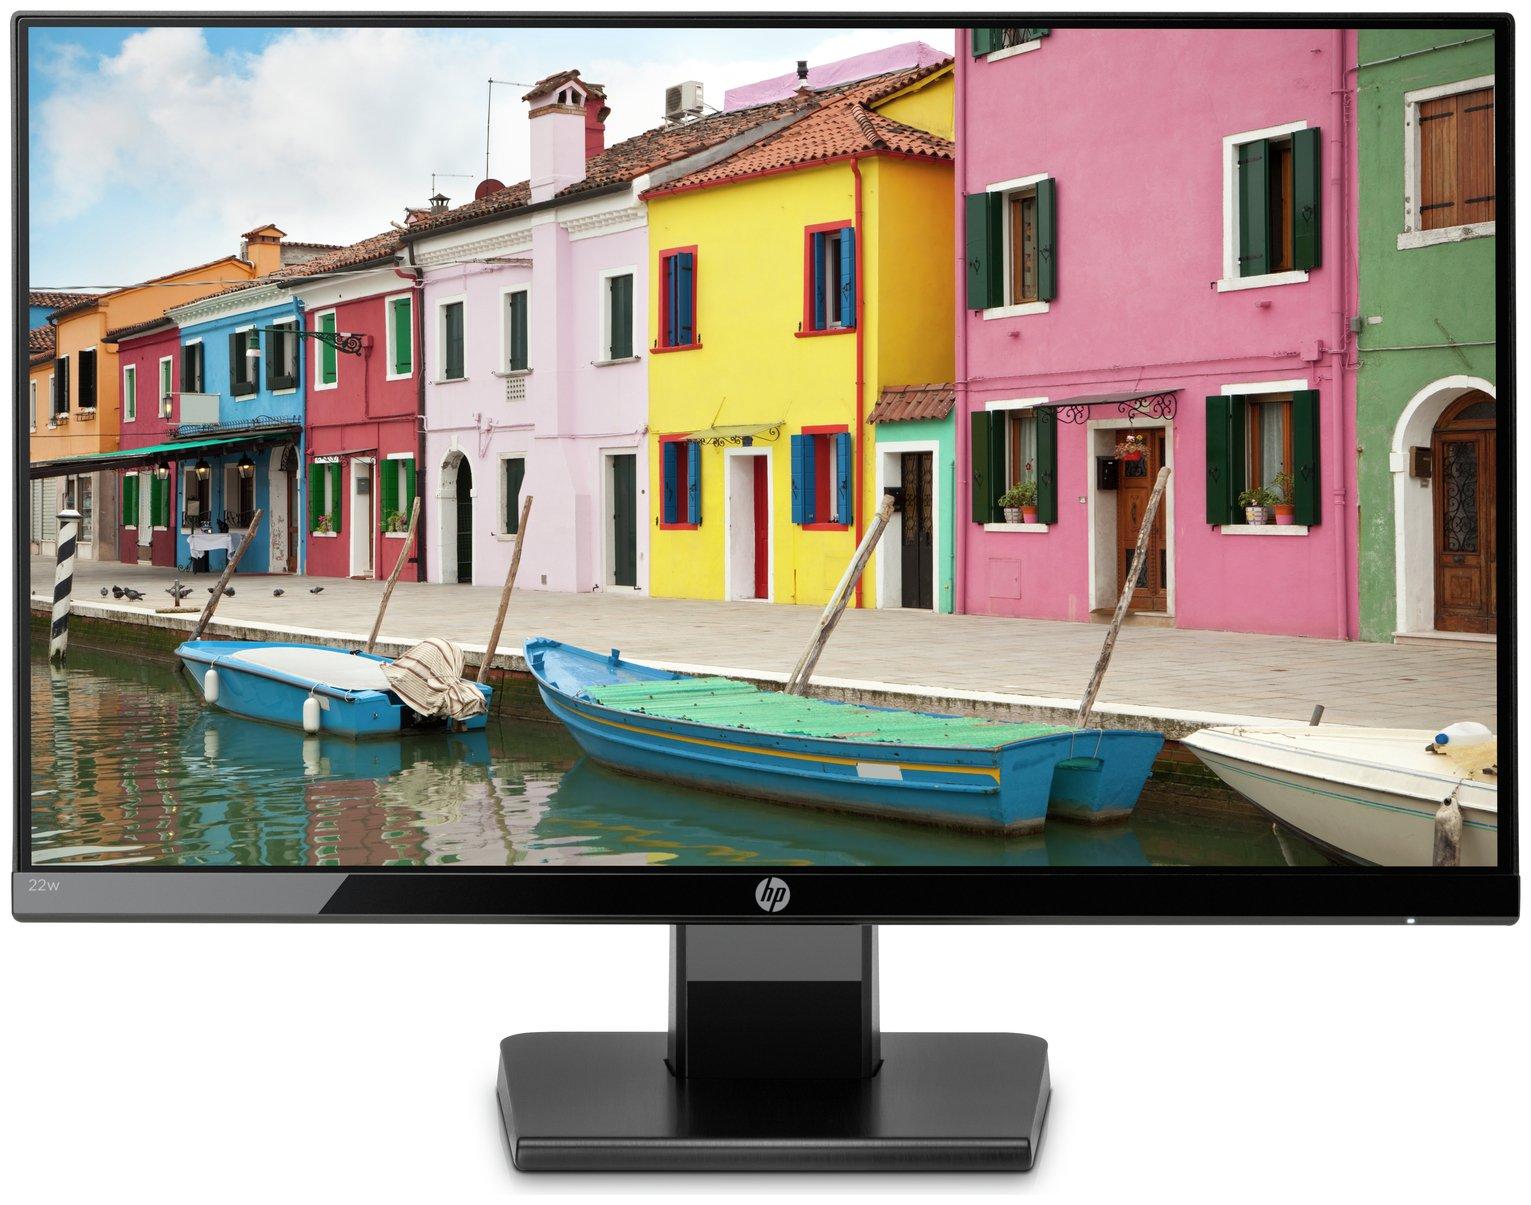 HP 22w 21.5 Inch FHD IPS Monitor - Black